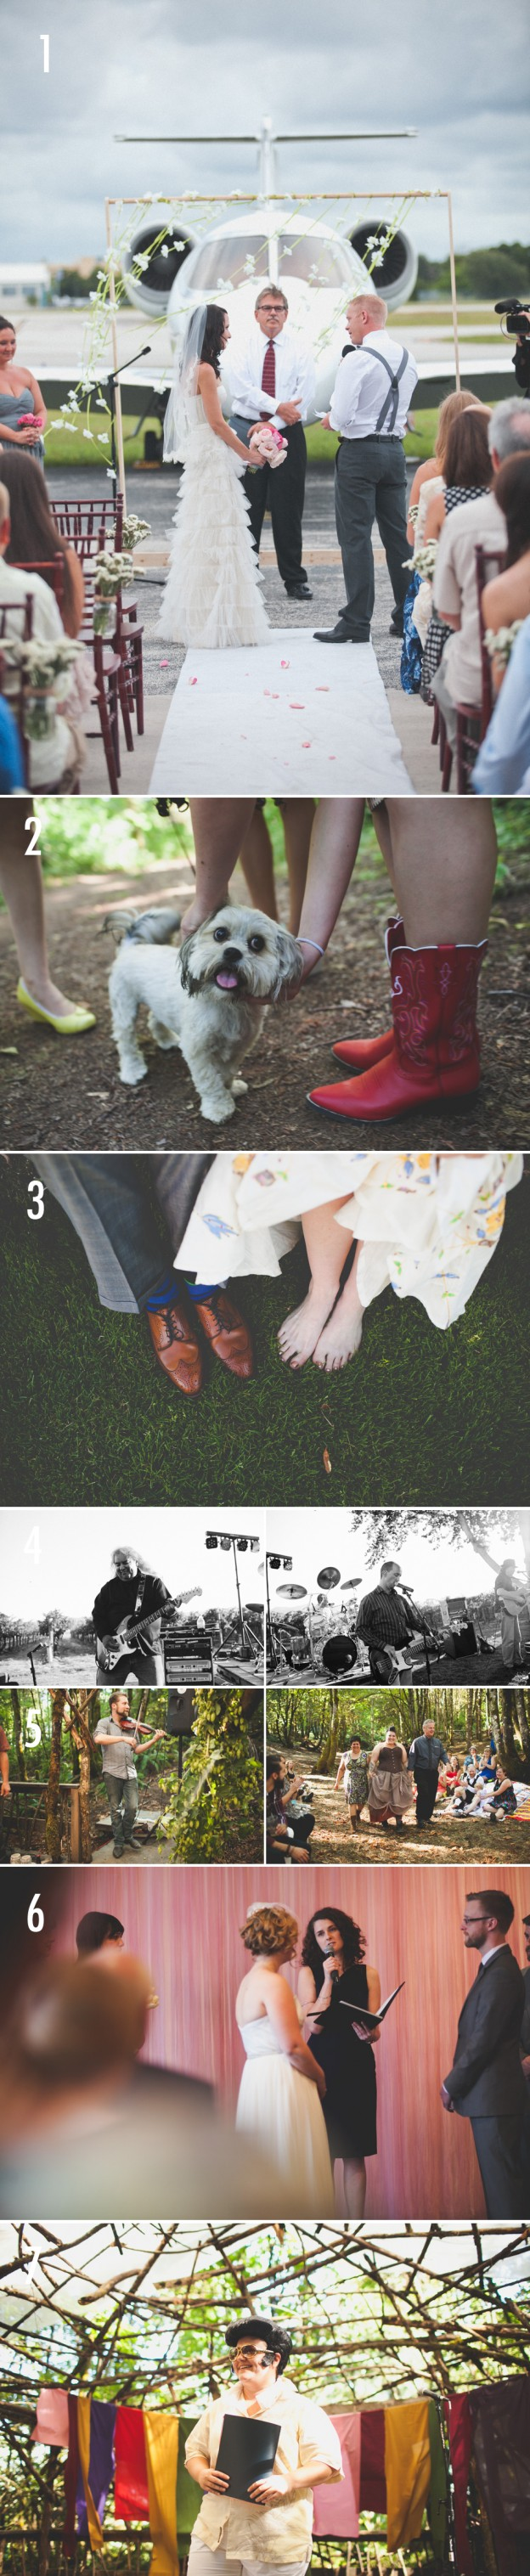 best wedding ceremony ideas